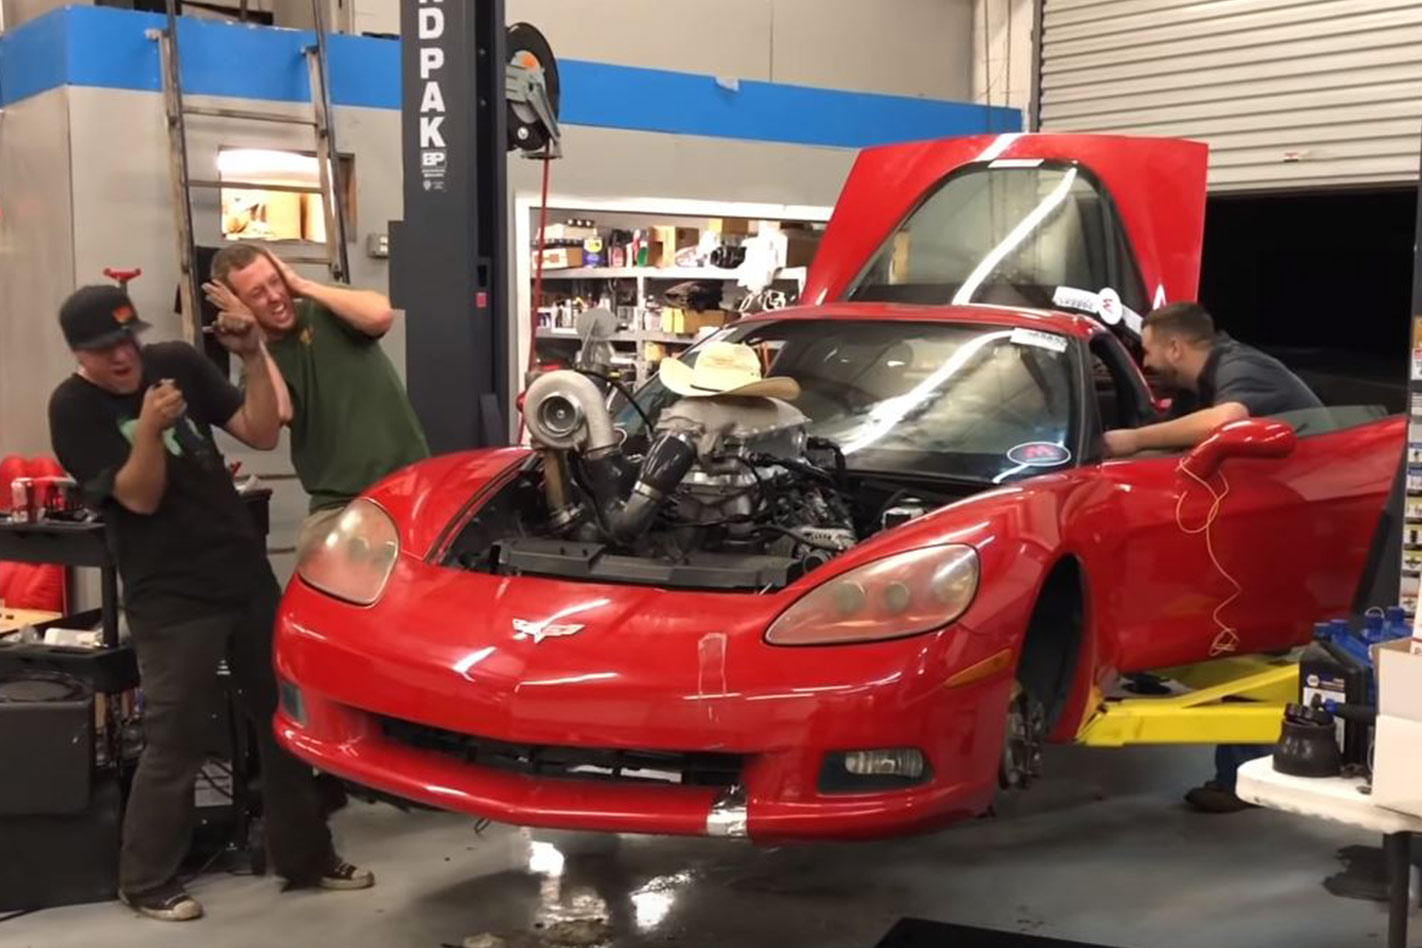 Cleetus McFarland's 740hp turbo LS-powered C6 Corvette budget build